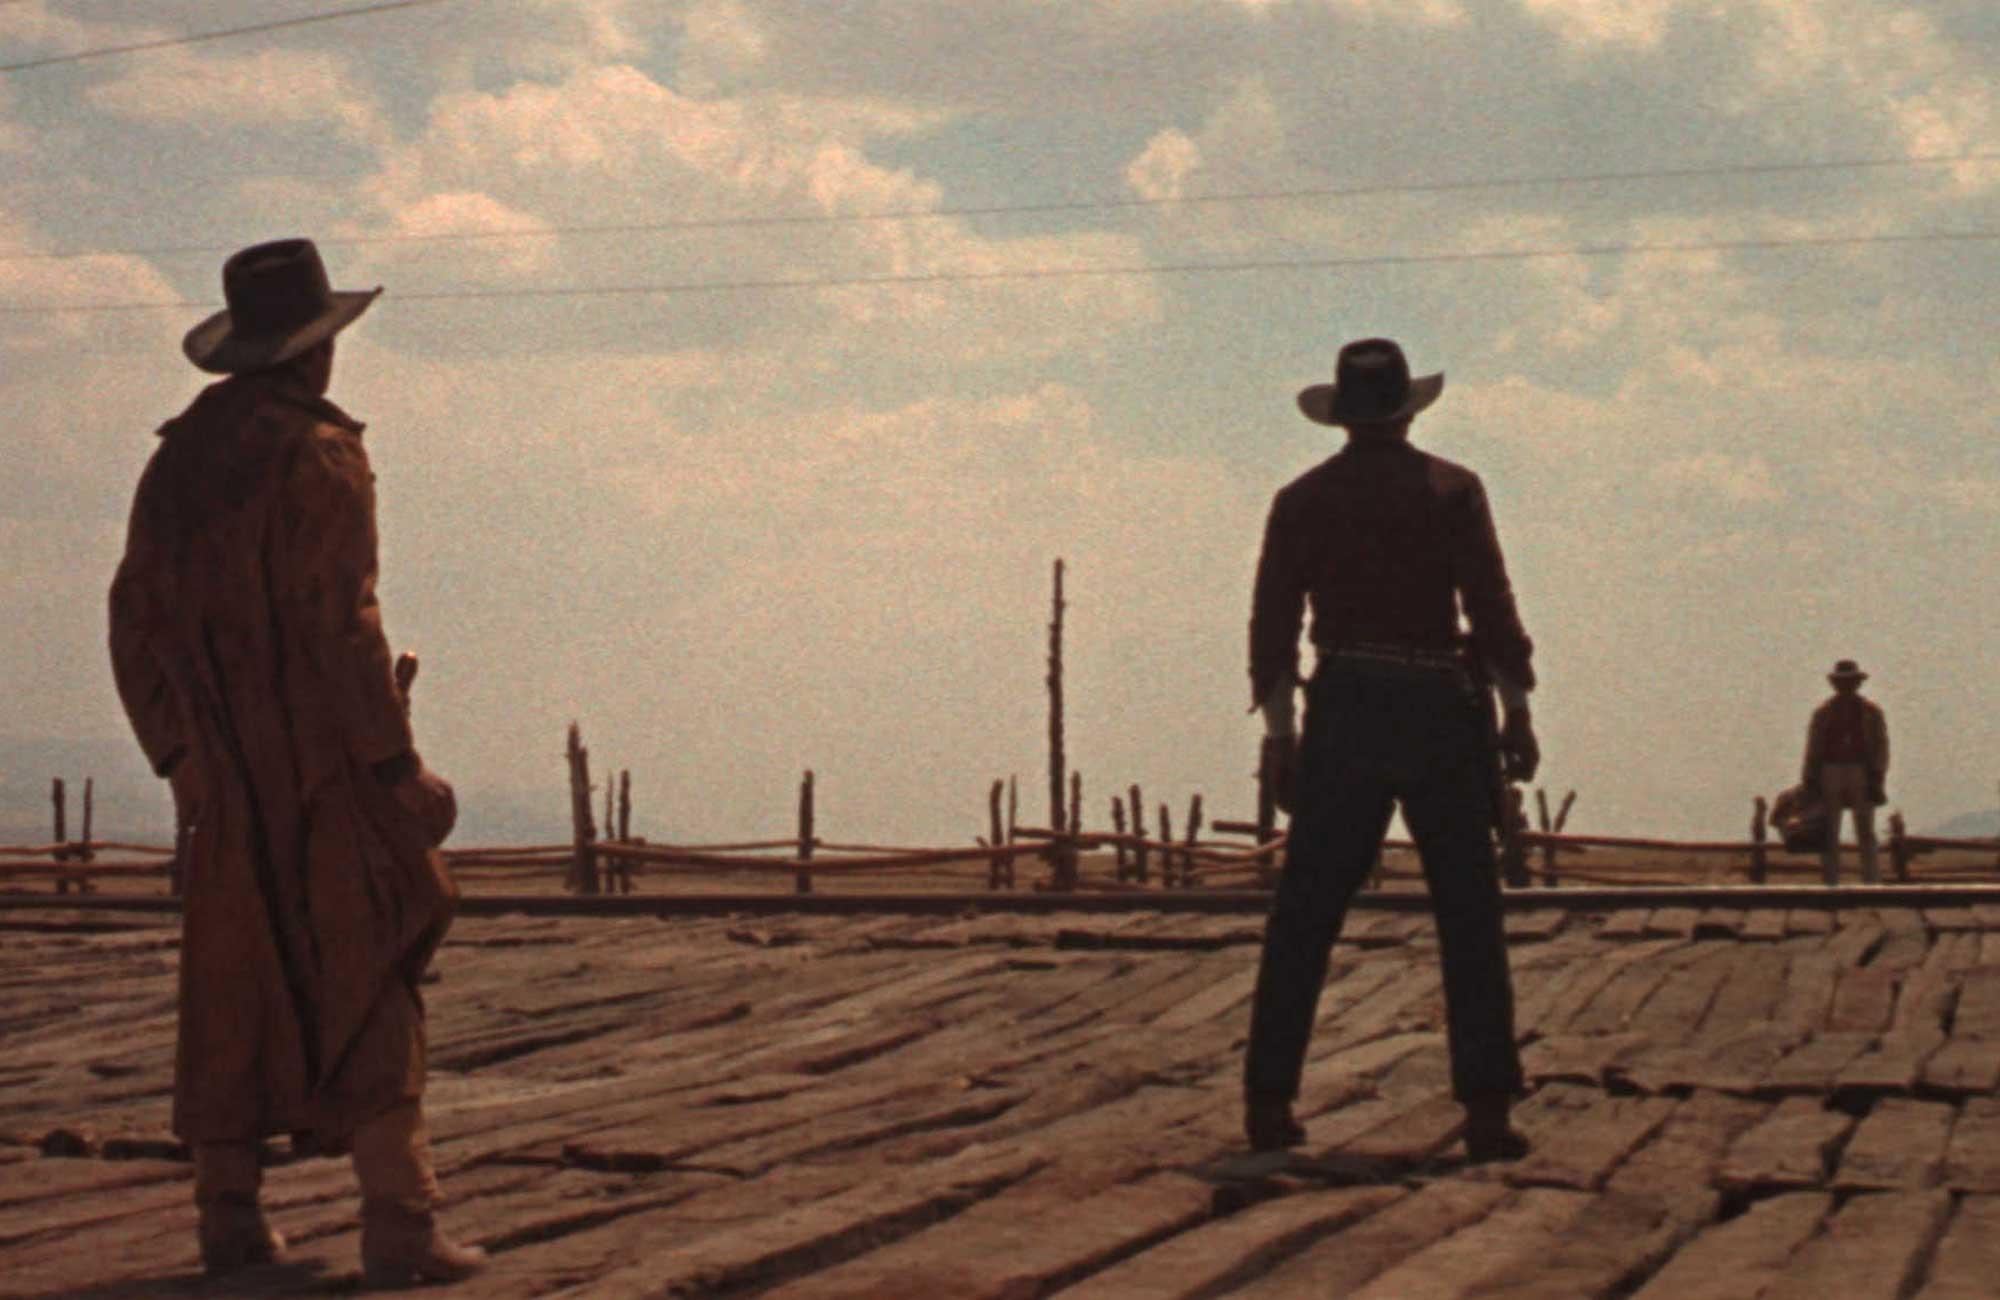 How Spaghetti Westerns Shaped Modern Cinema